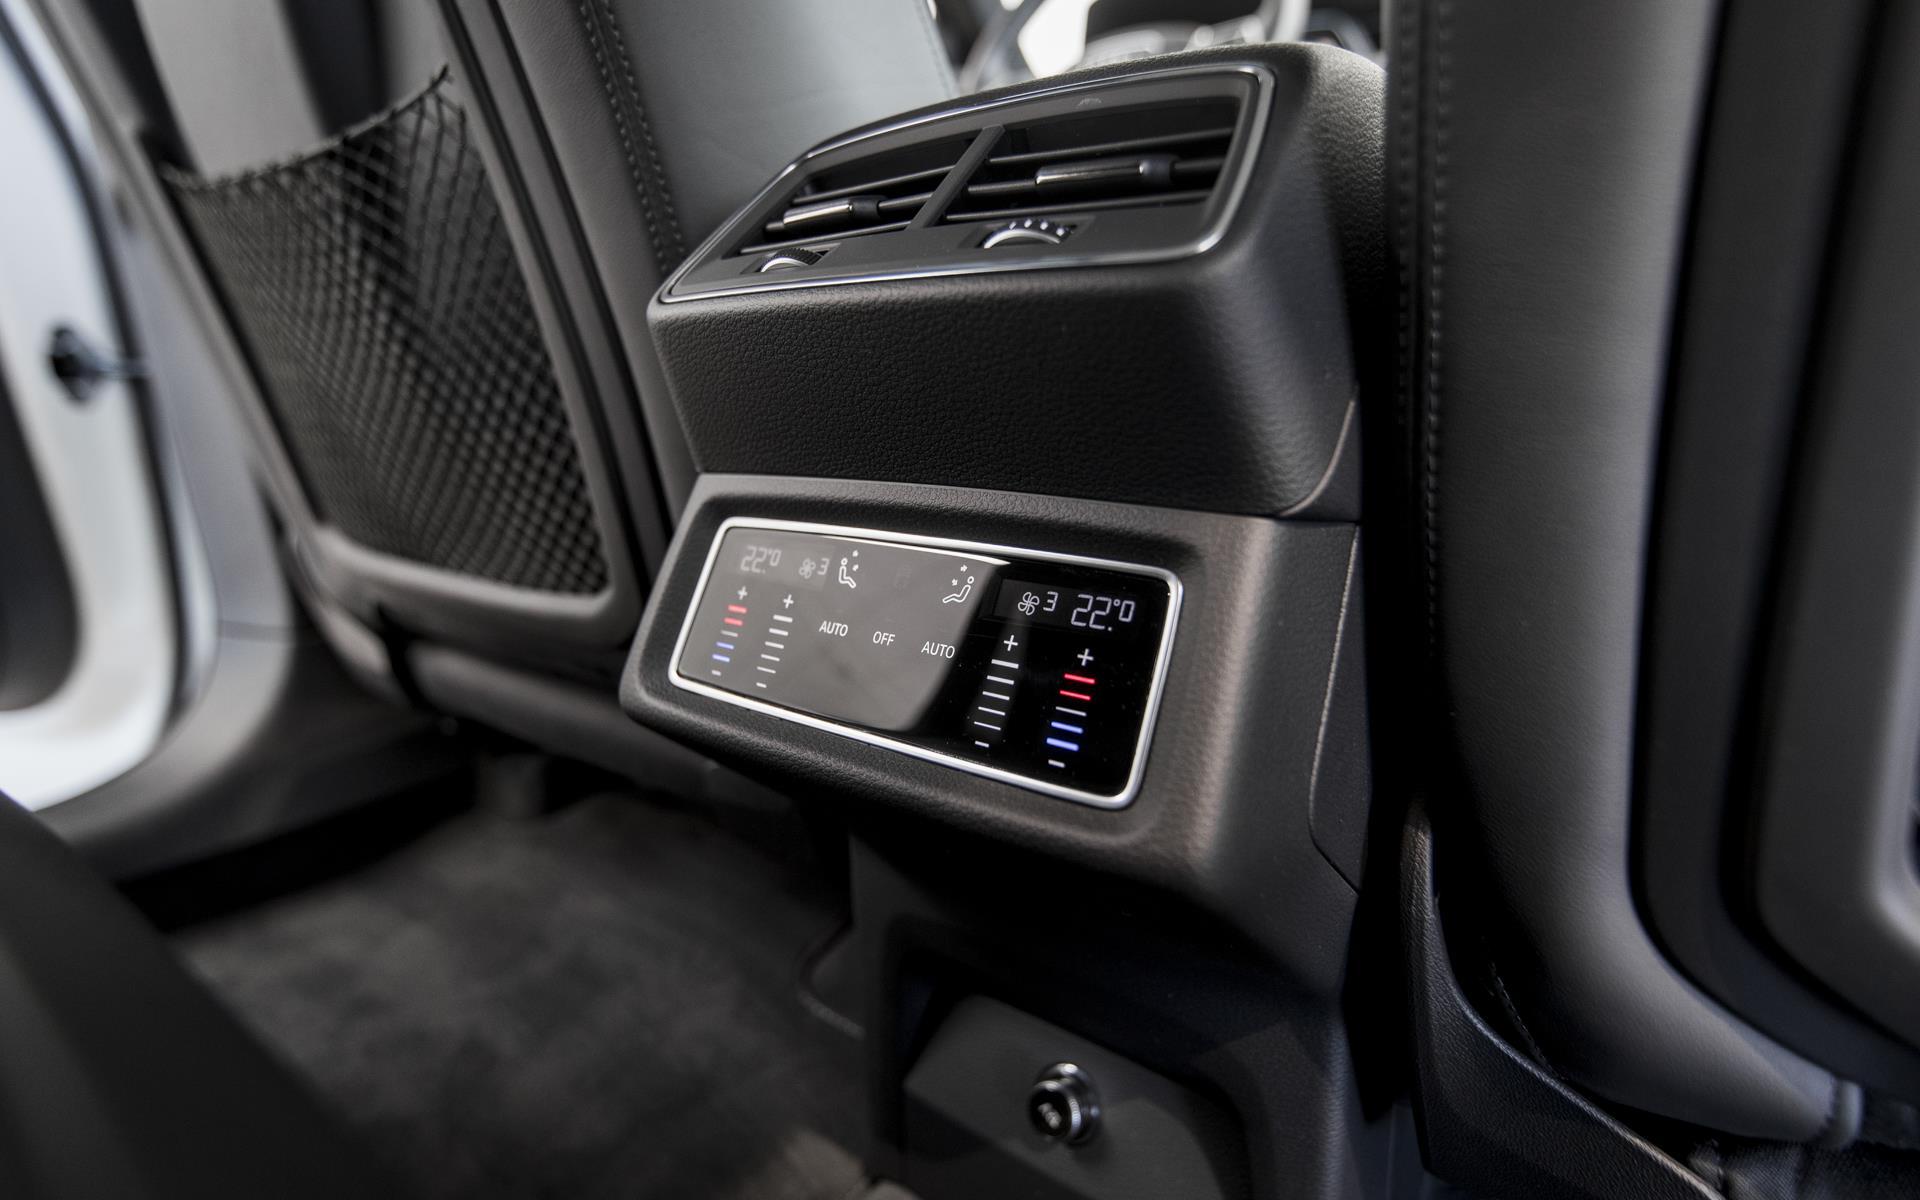 EL Advanced Quattro 408HK 5d Trinl. Gear image14